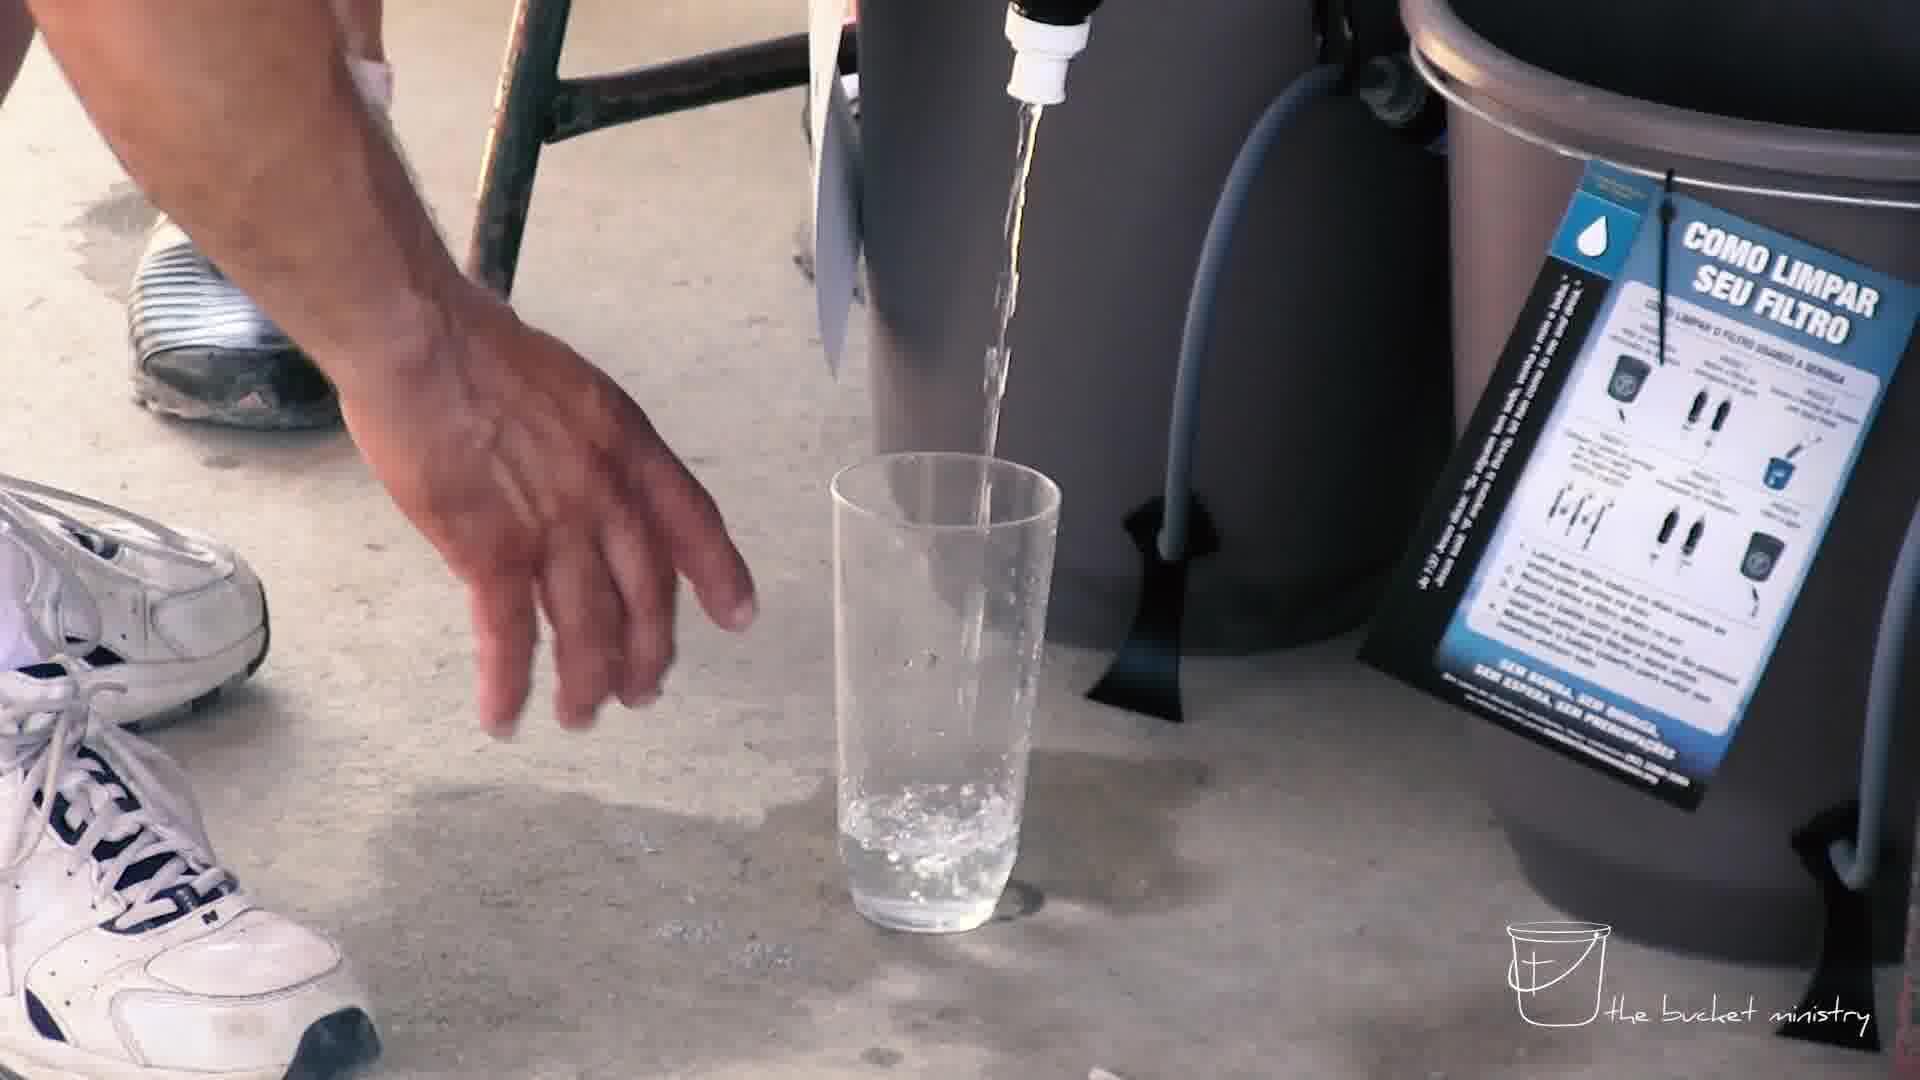 sharing God's love through clean water